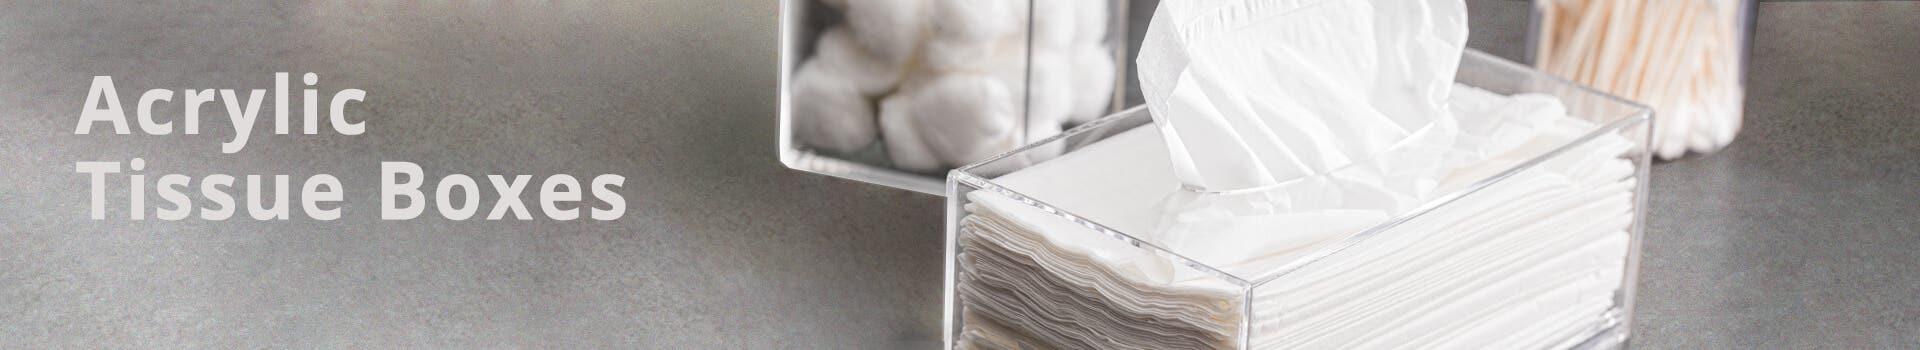 Plastic Acrylic Tissue Boxes